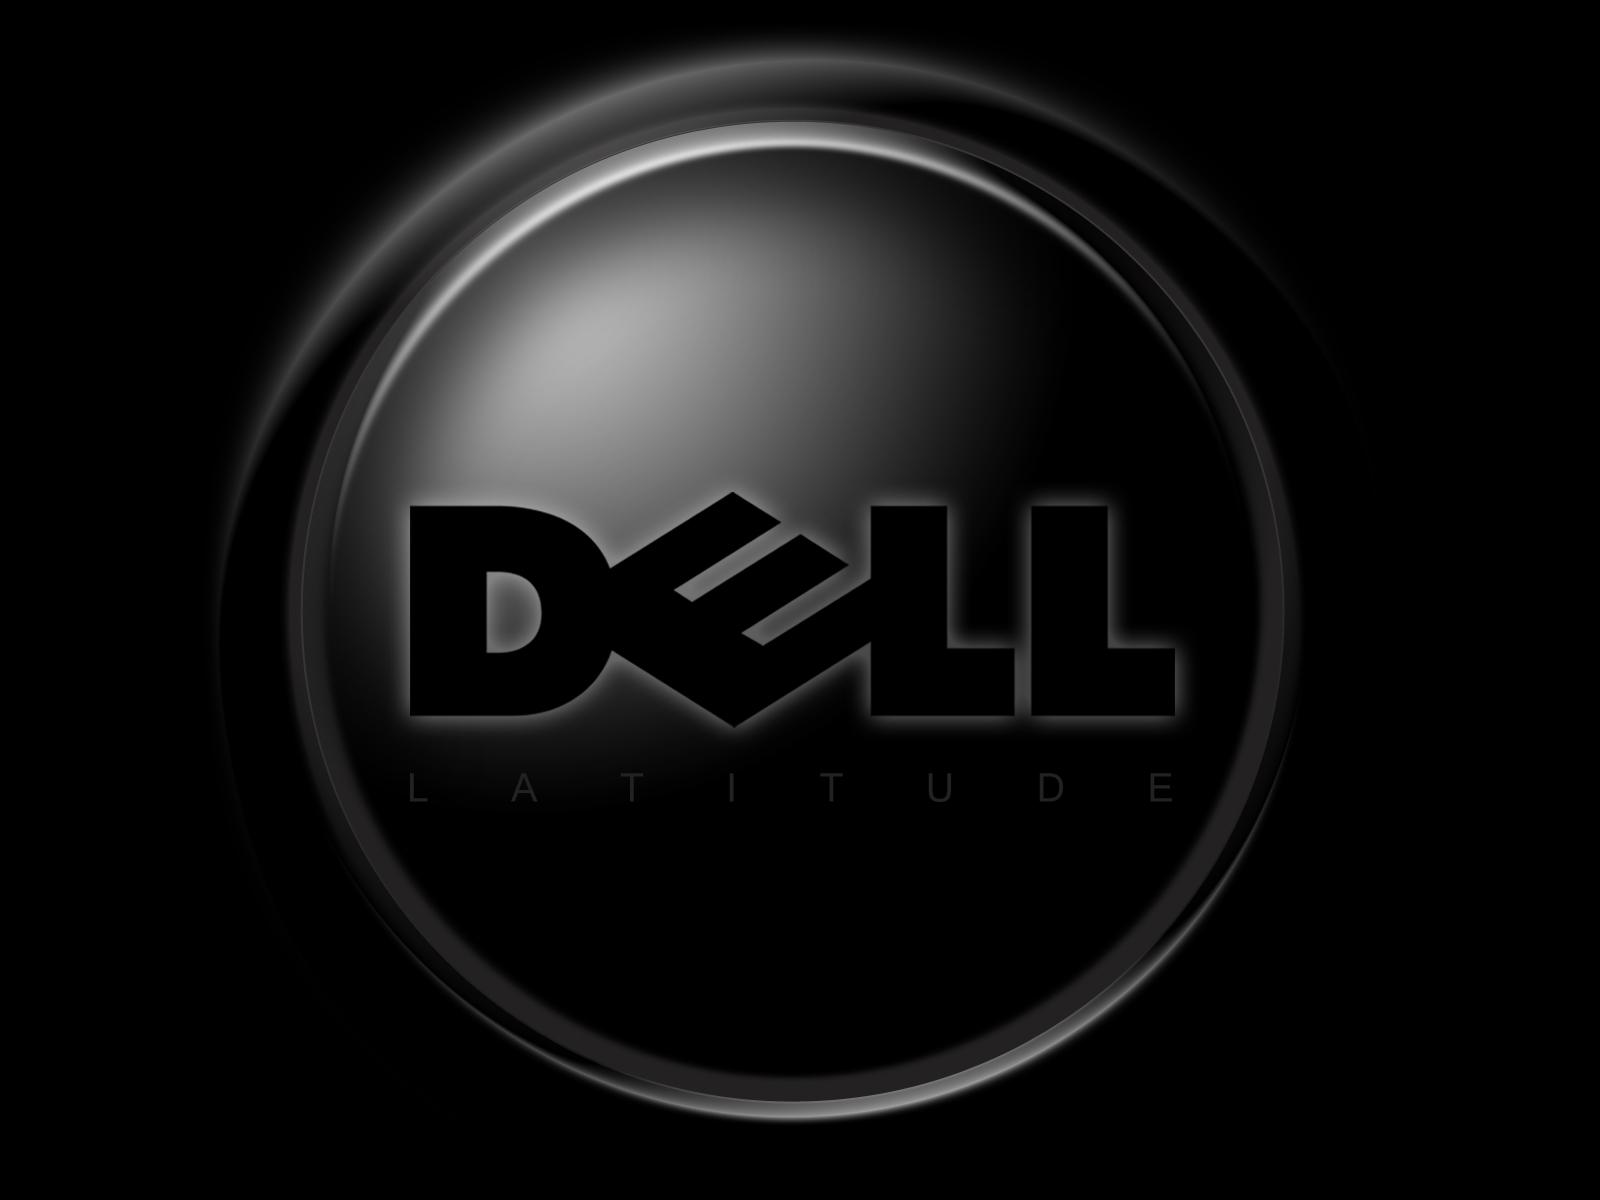 Cute Wallpapers For Dell Laptop Dell Hd Wallpaper 1920x1080 Hd Wallpaper